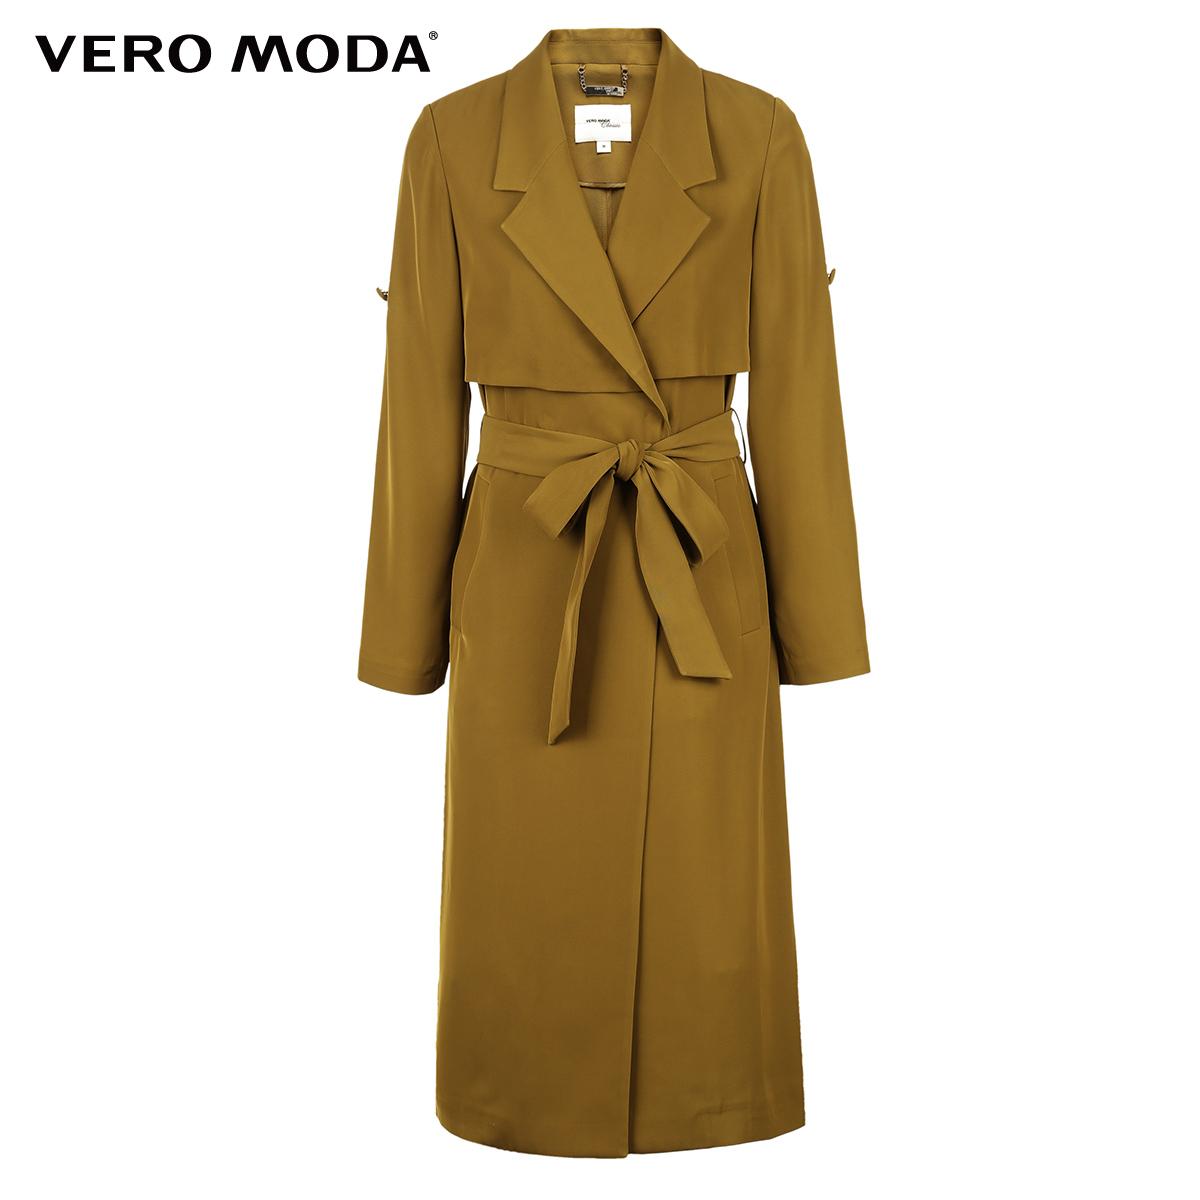 Vero Moda2017冬季新款英伦风两穿轻薄中长款风衣|317421507